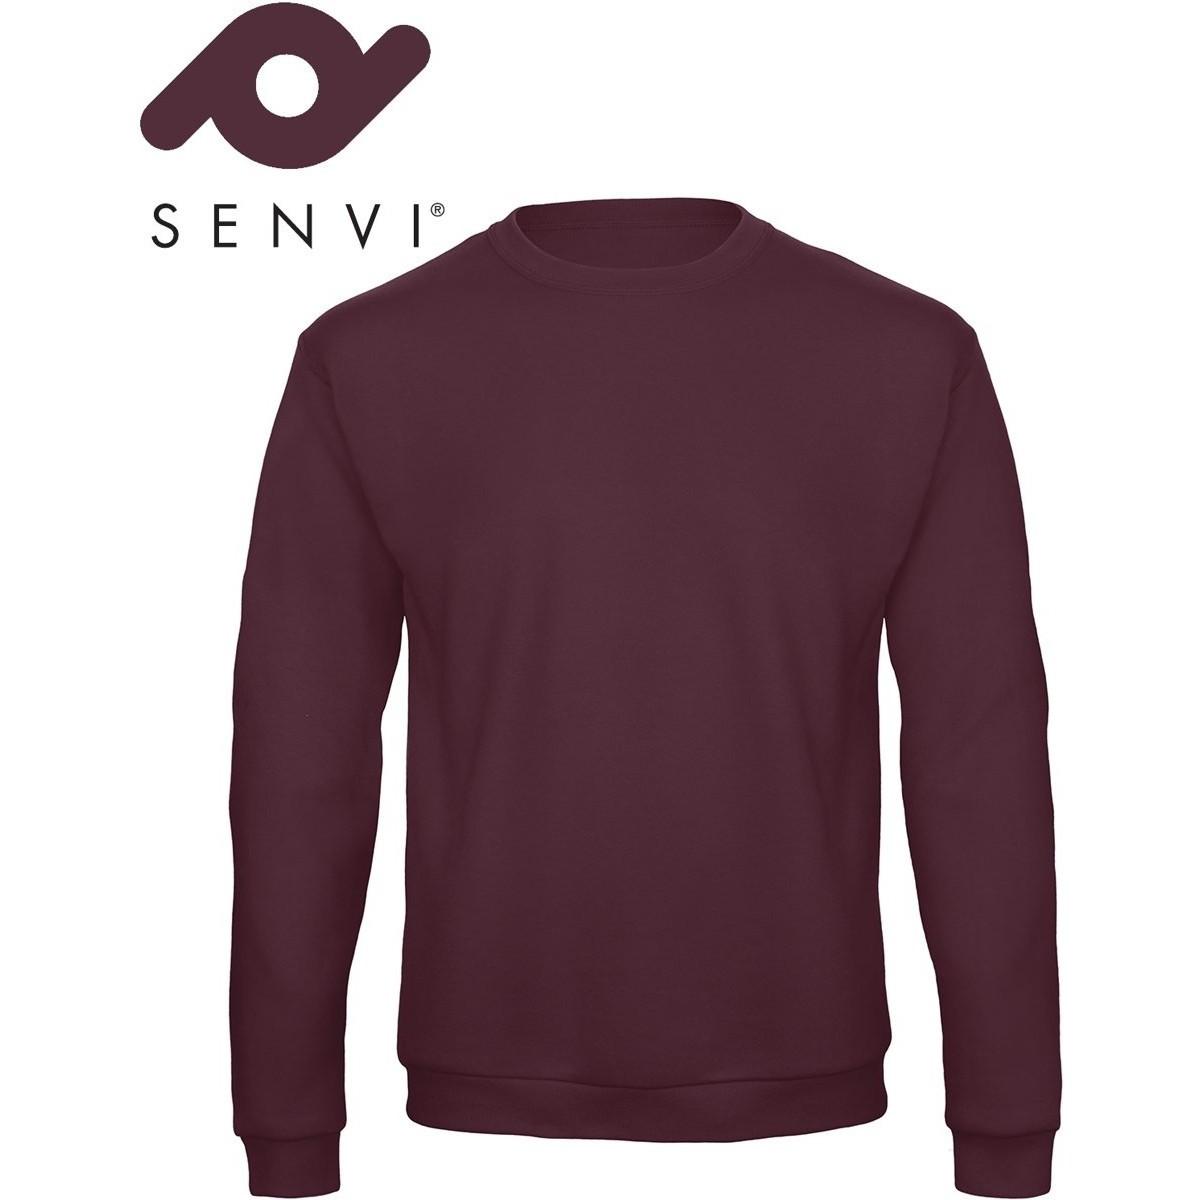 Senvi Basic Sweater (Kleur: Burgundy) - (Maat XL)